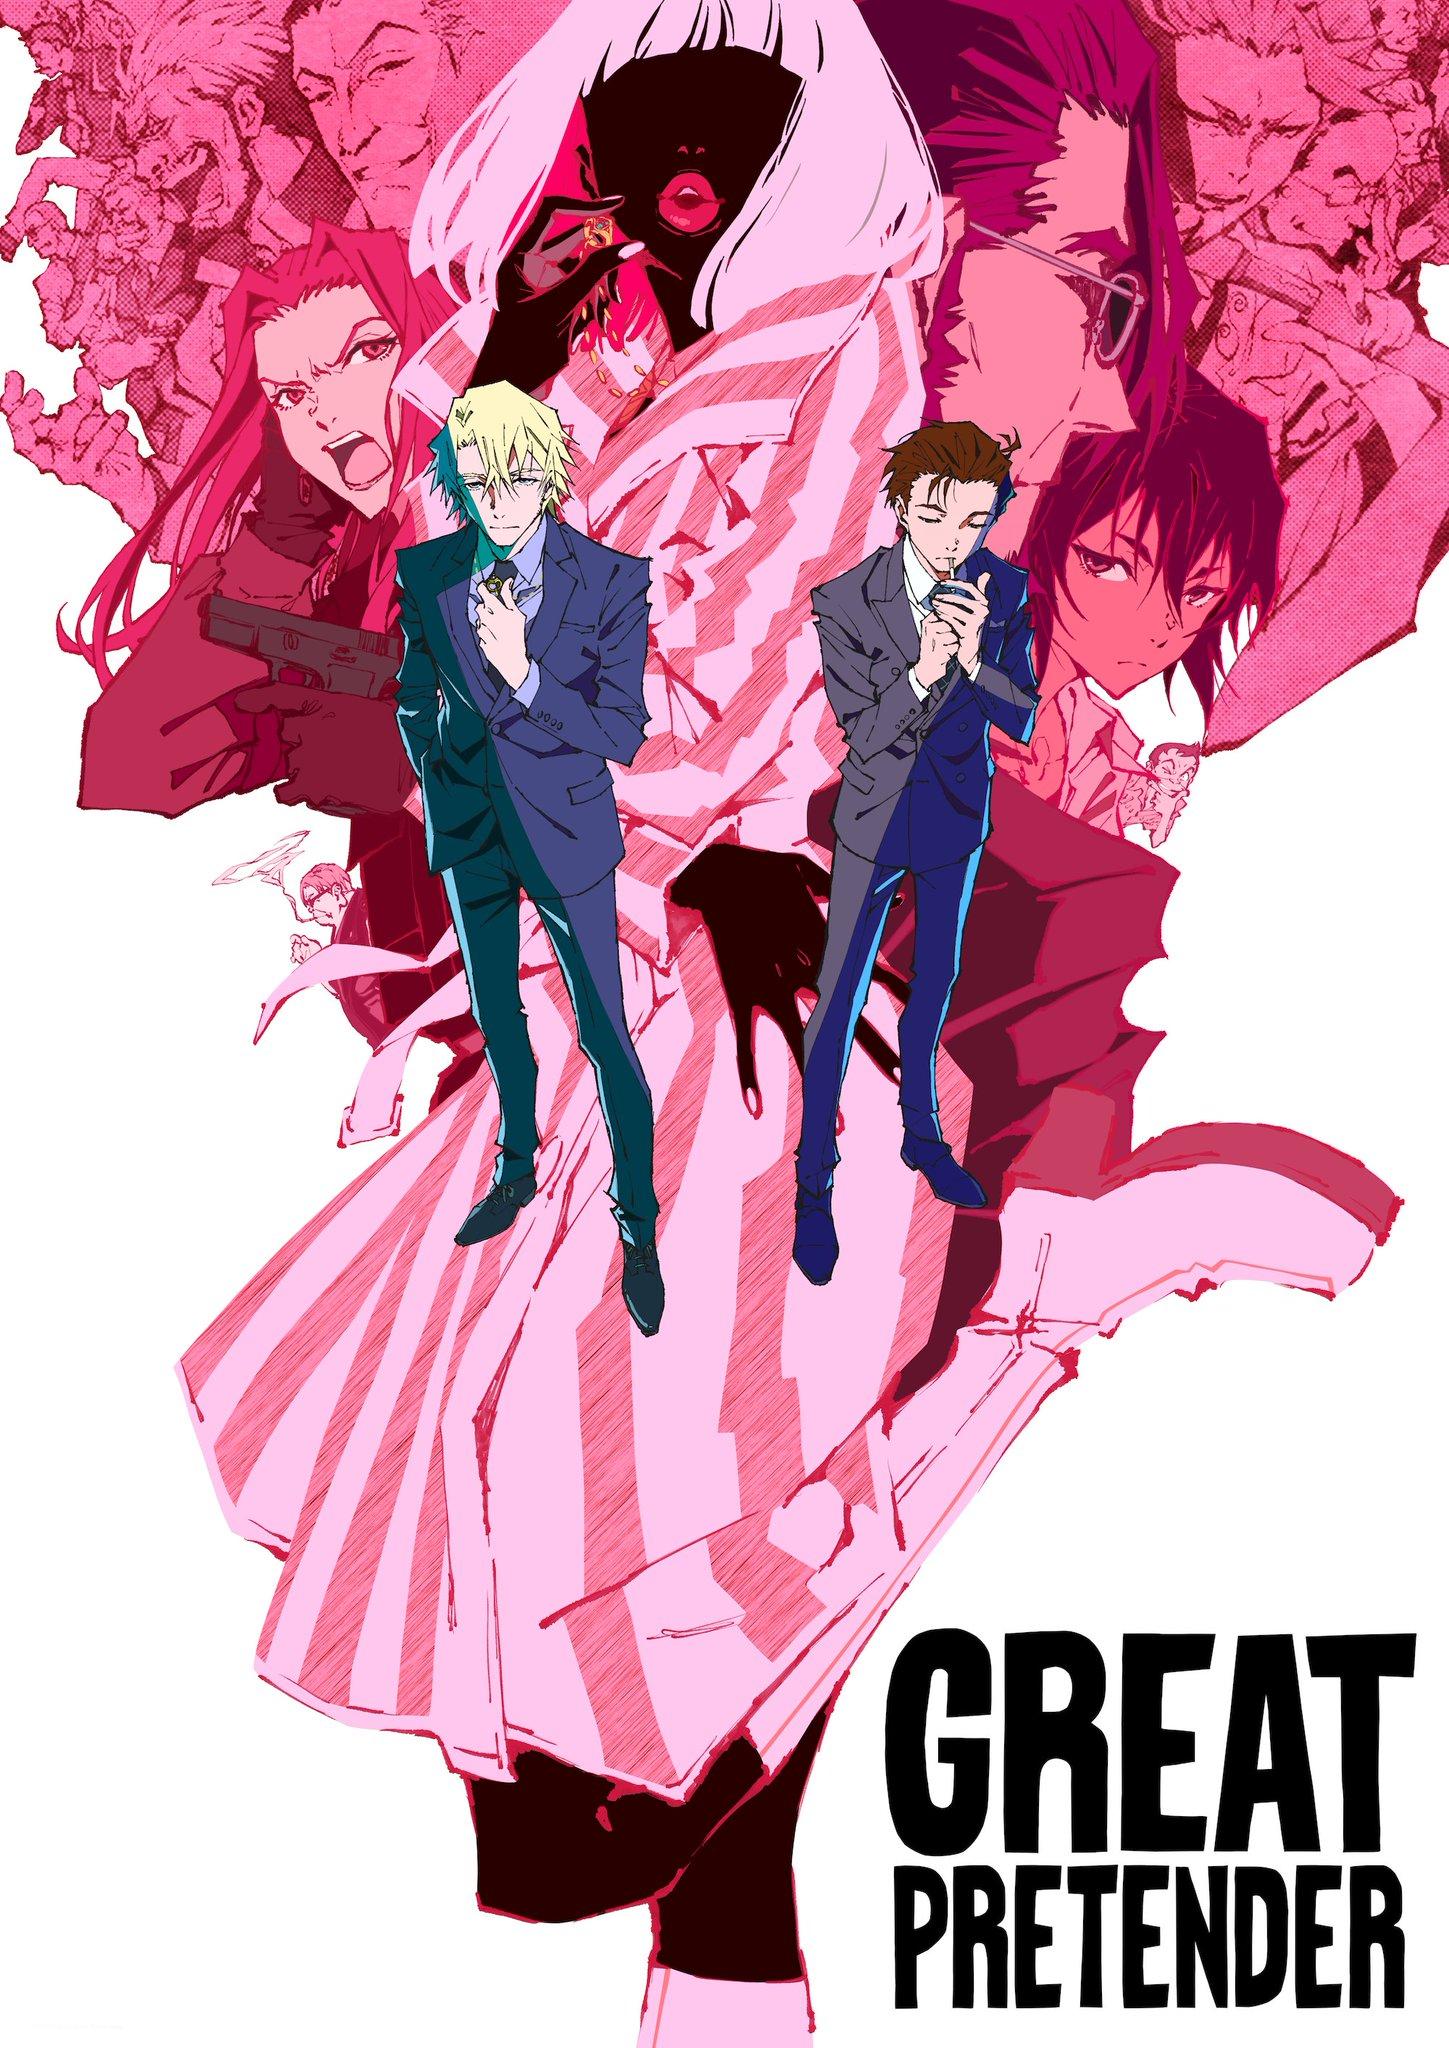 GREAT PRETENDER – Anime Analysis